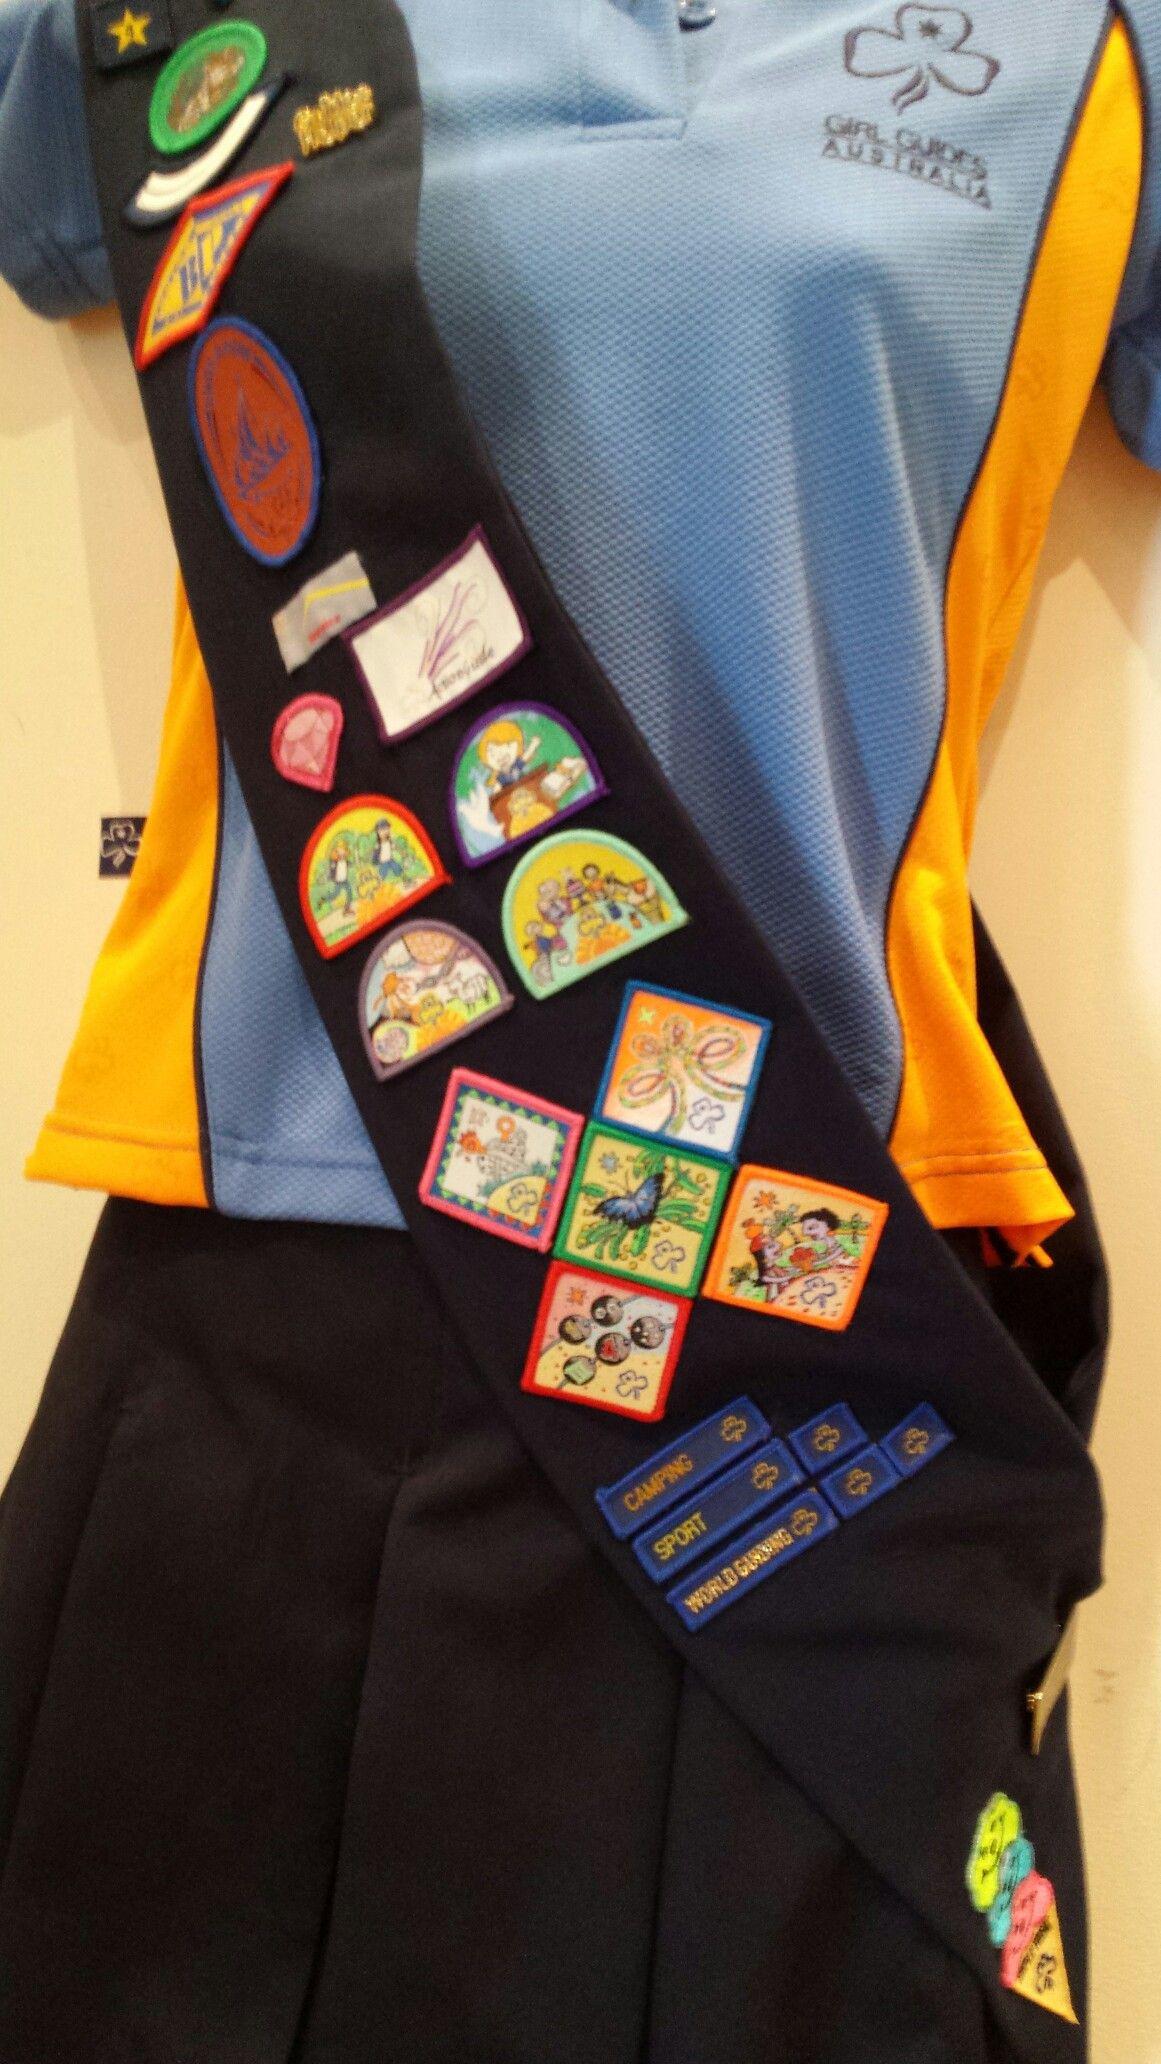 Australia Girl Guides - Vintage Girl Scout